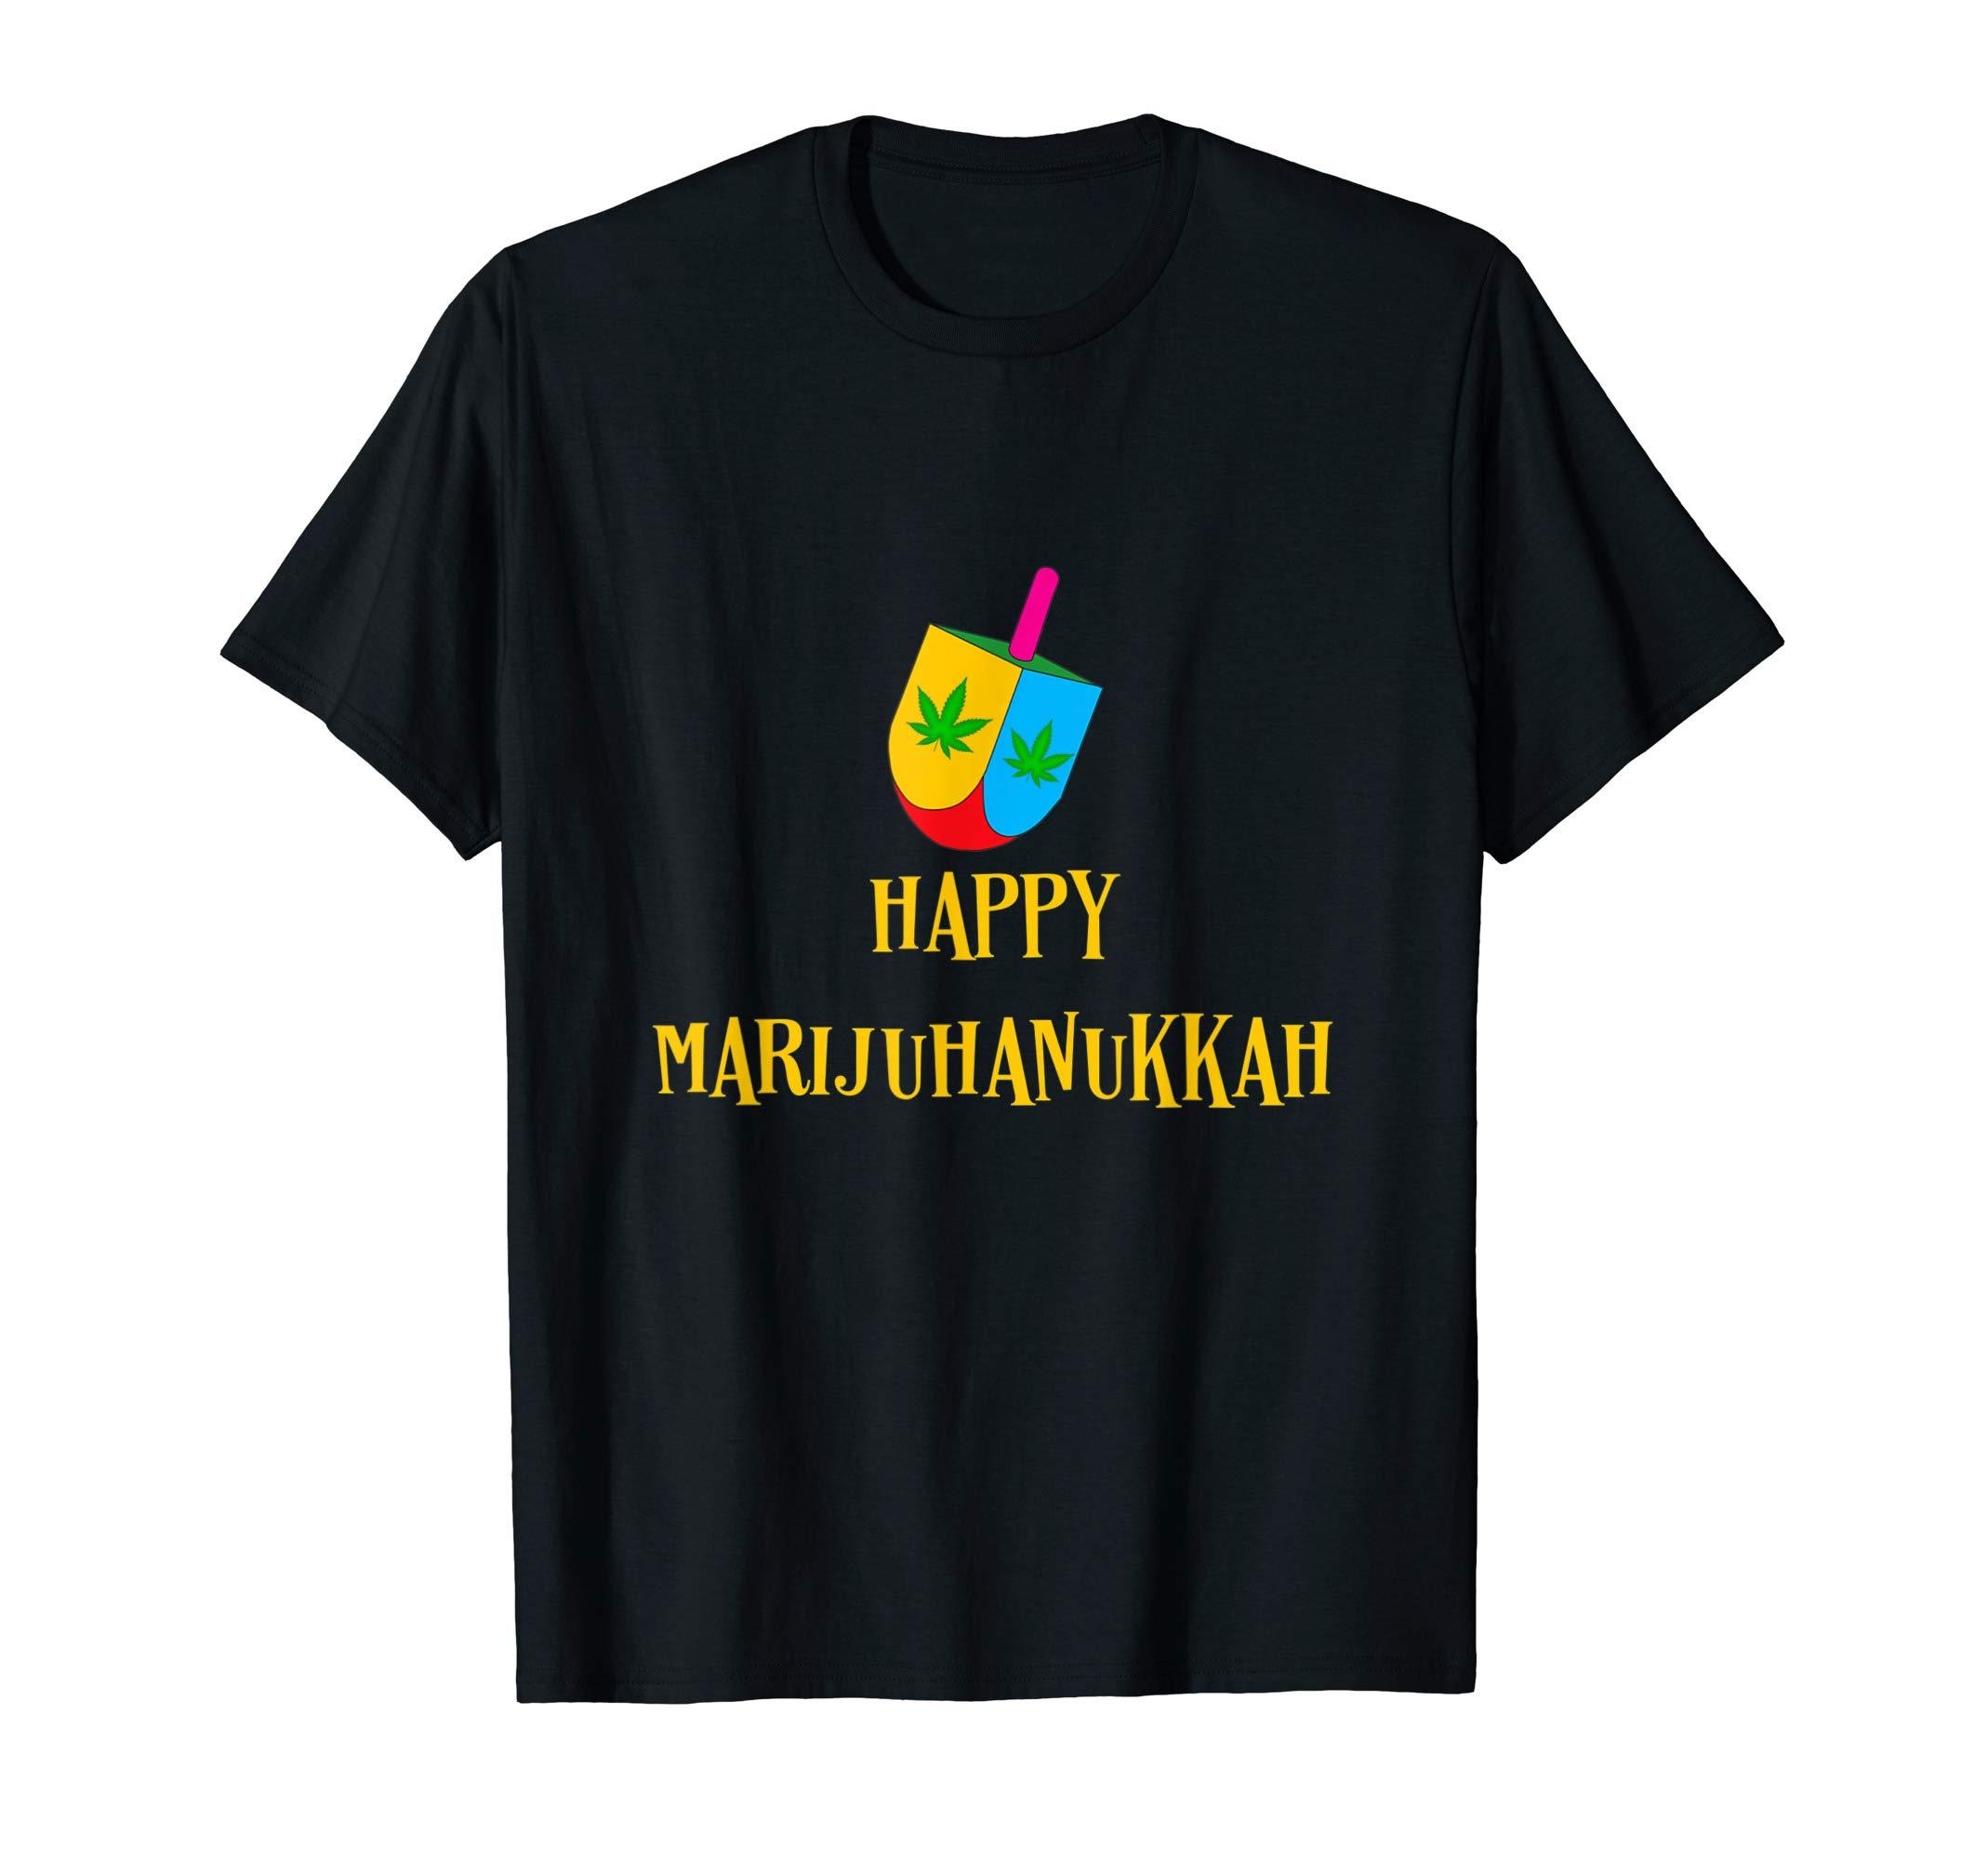 Hanukkah Weed Dreidel Happy Marijuhanukkah Am Israel High T-Shirt